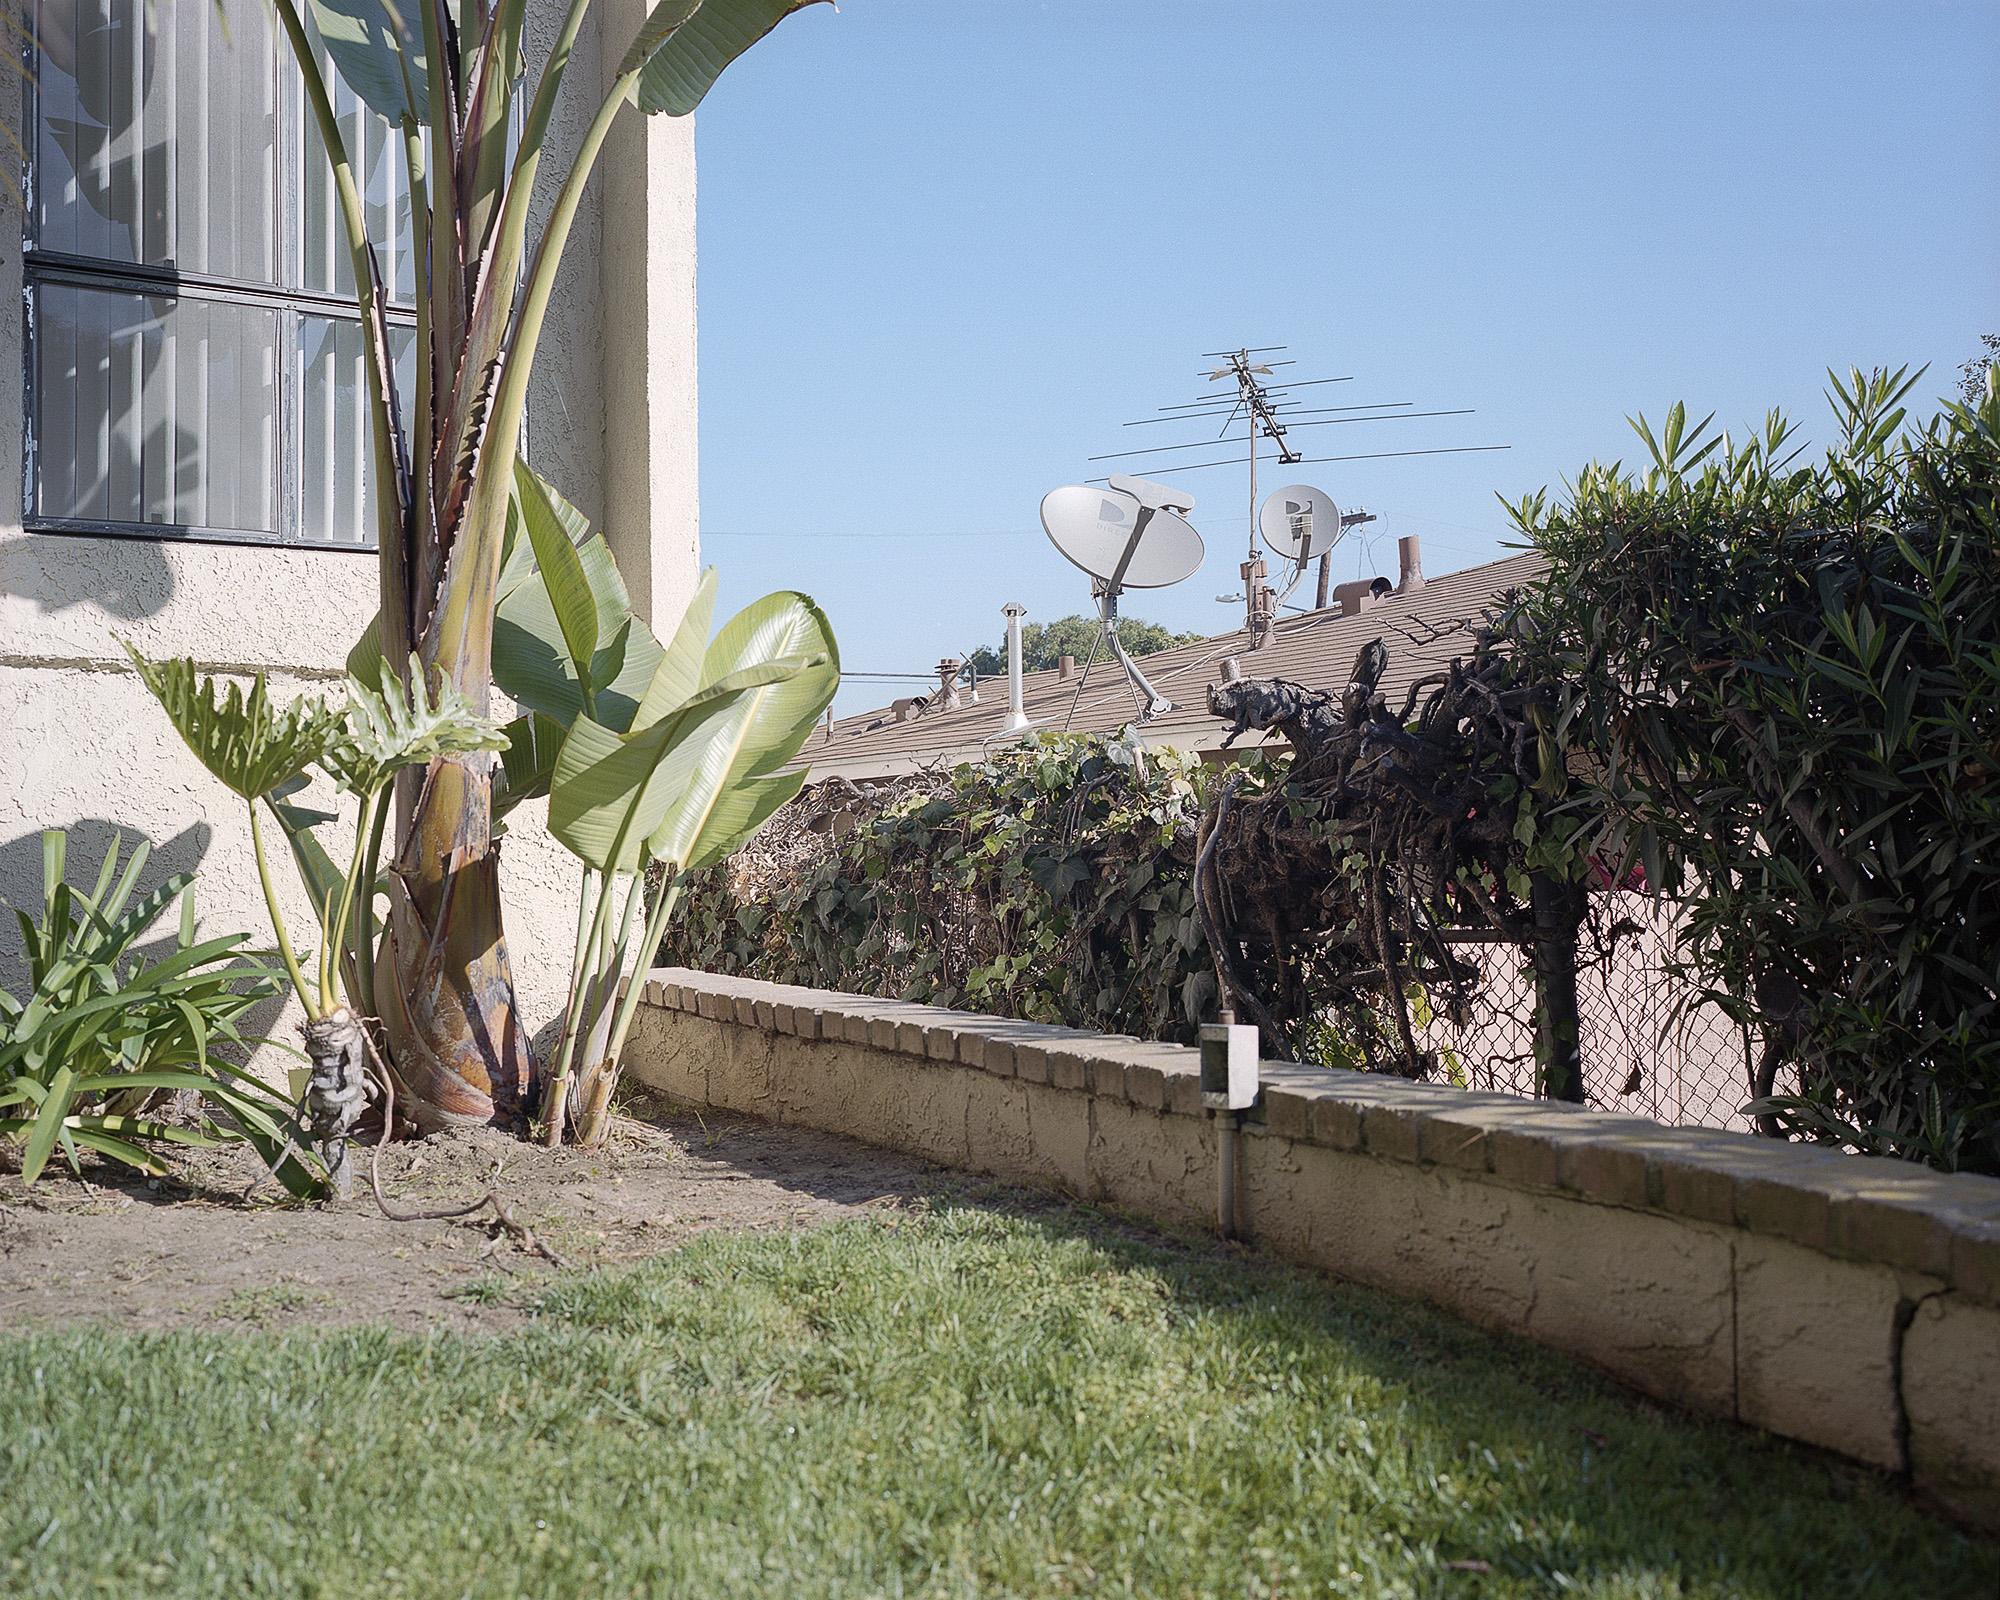 Plants Satellite Dish.jpg